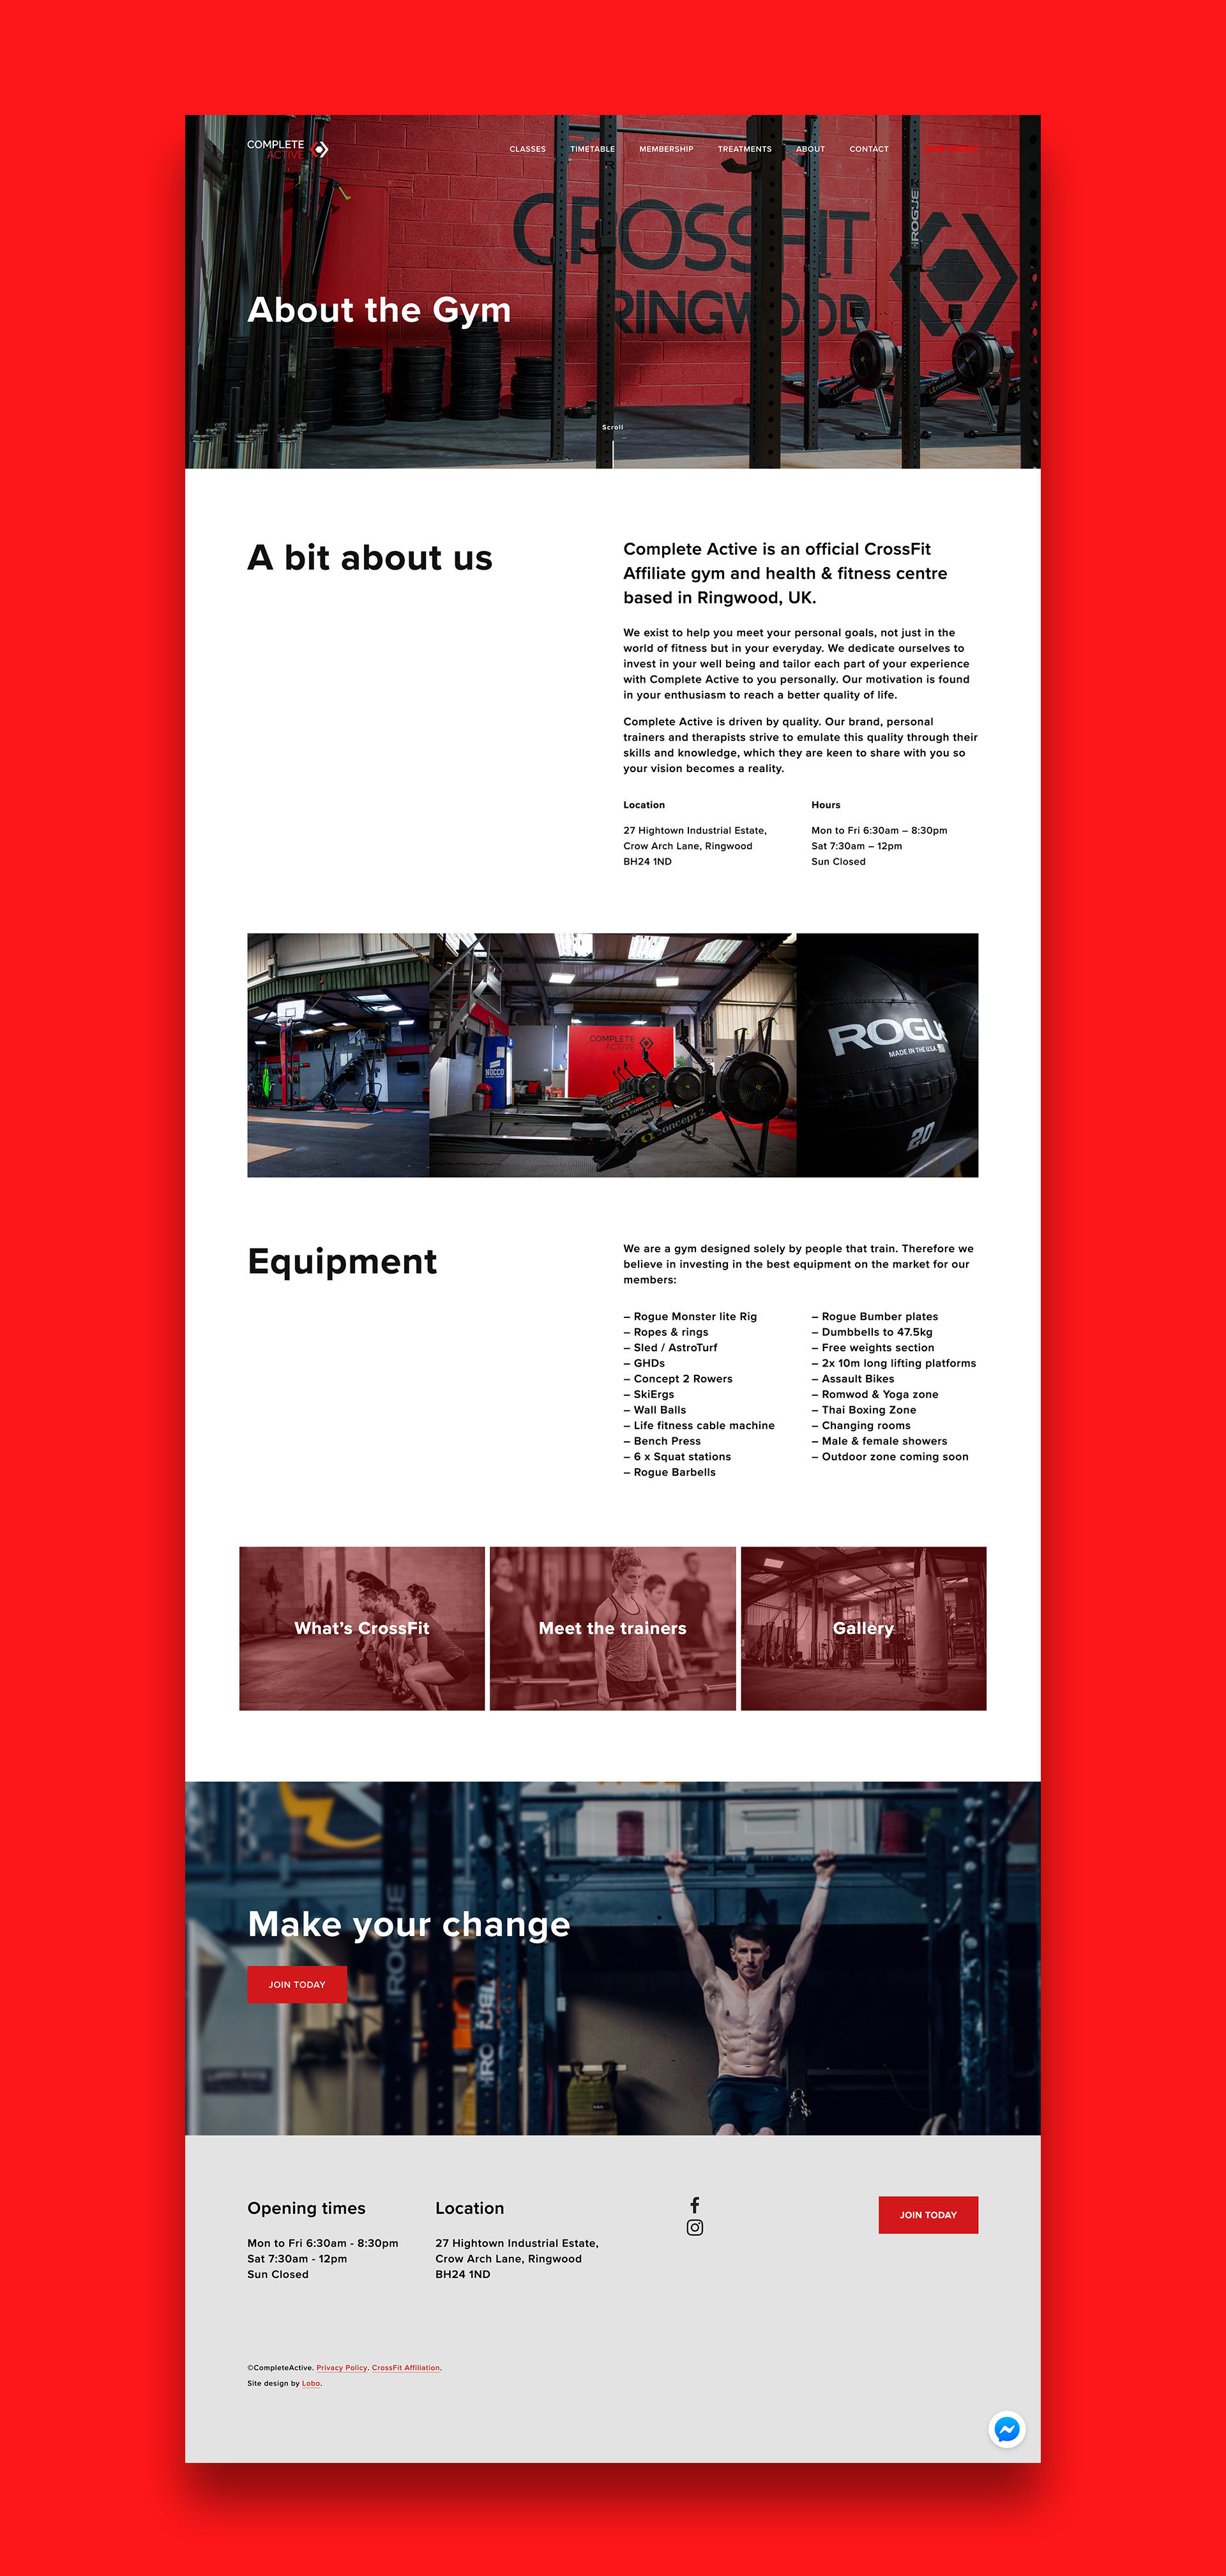 07-Lobo-Creative-Complete-Active-digital-website-design-development-in-Bournemouth.jpg